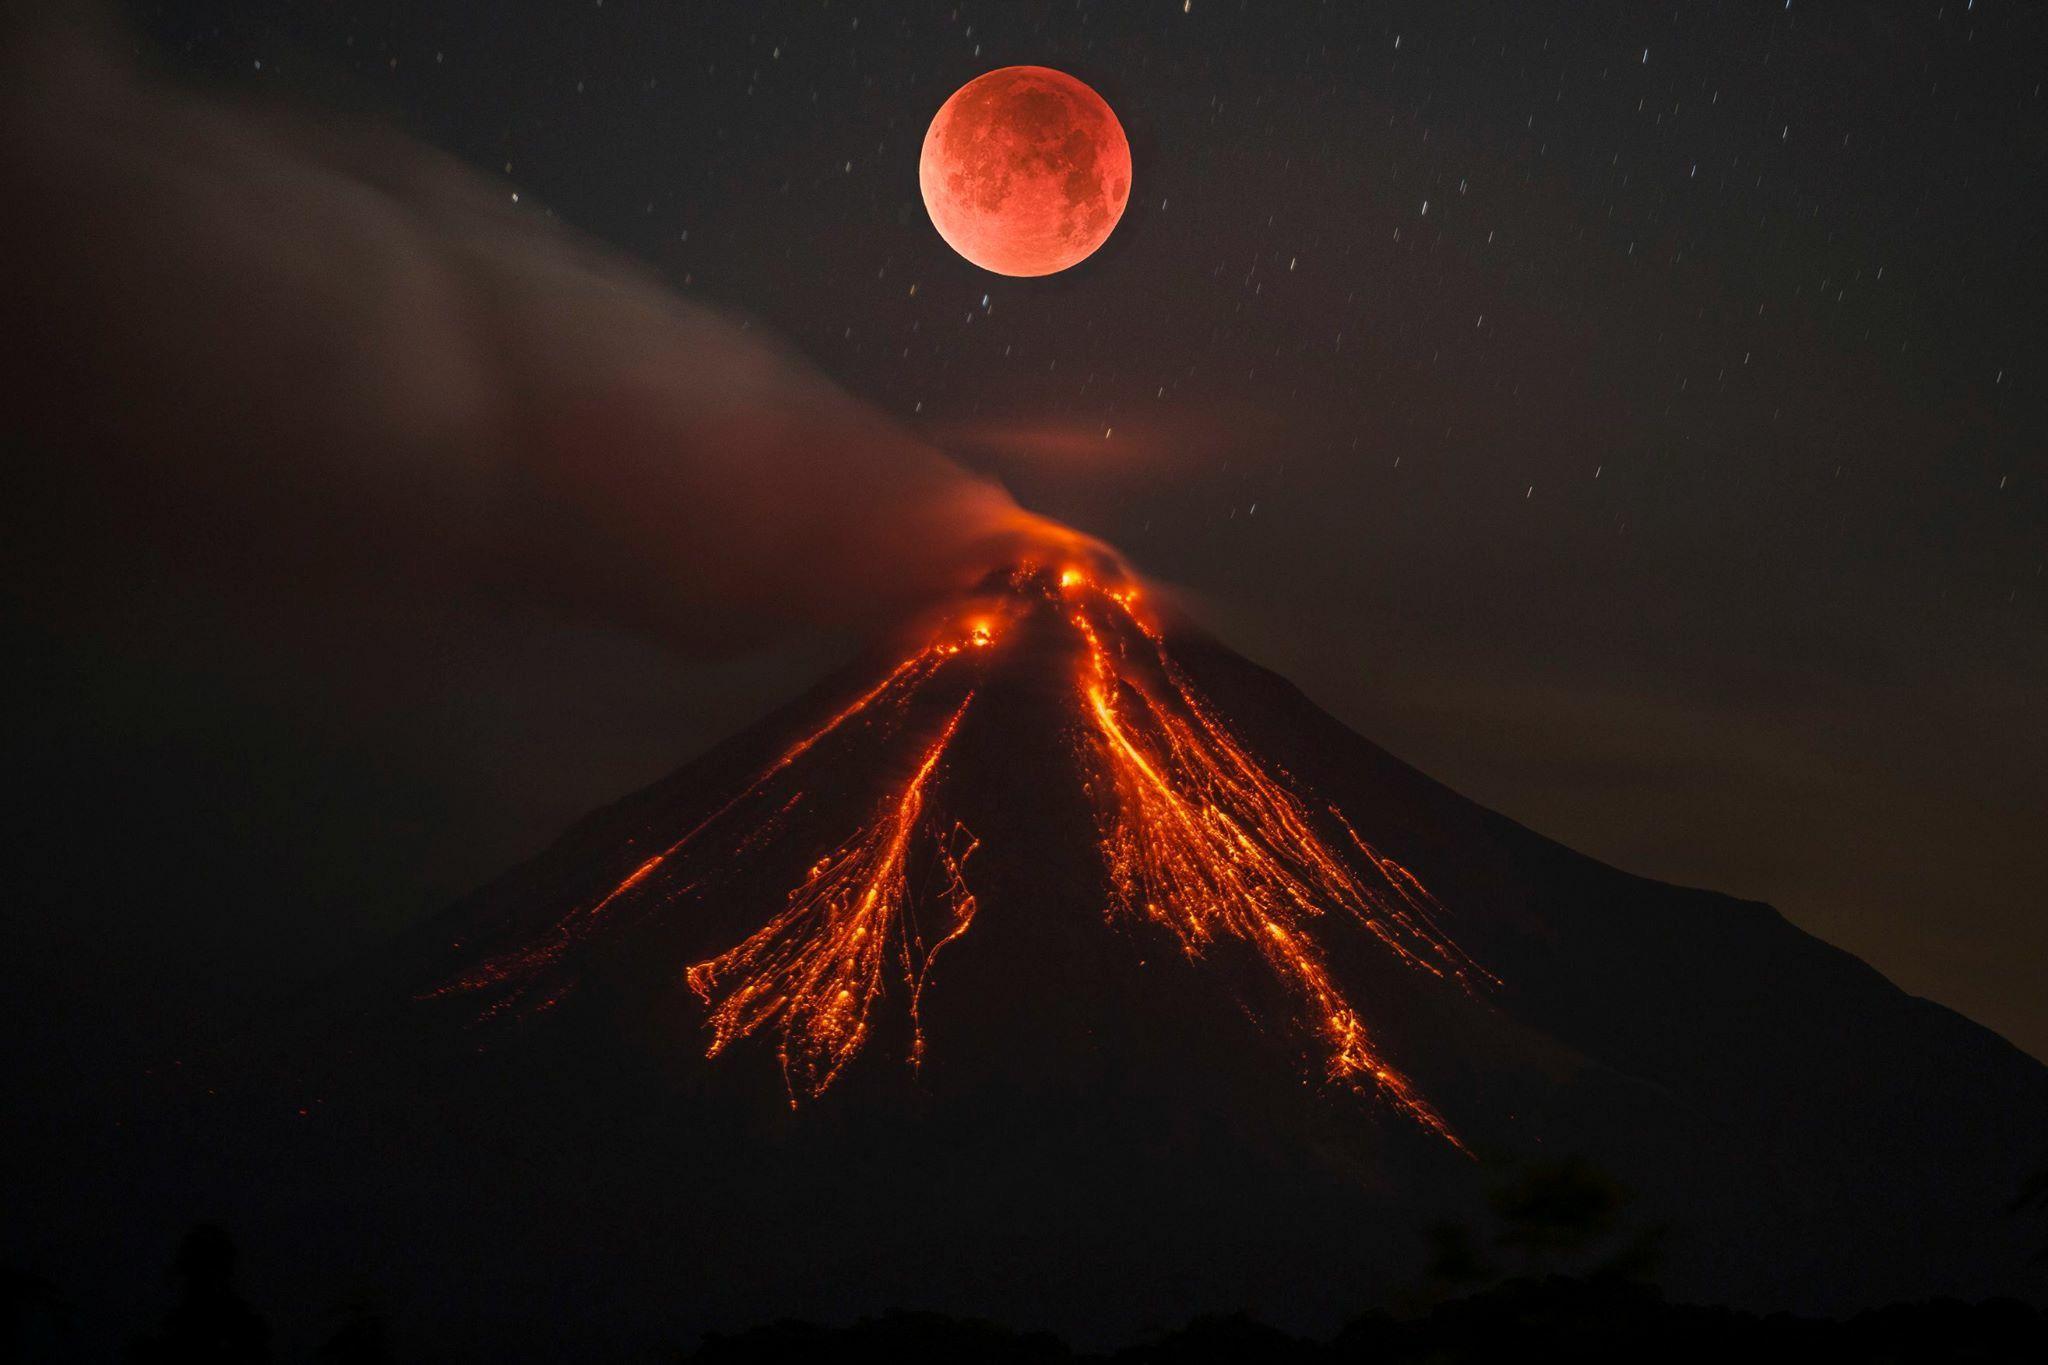 Pin By Citlali De Aguirre On México Mexicano Mexican Pinterest - Active volcanoes in mexico